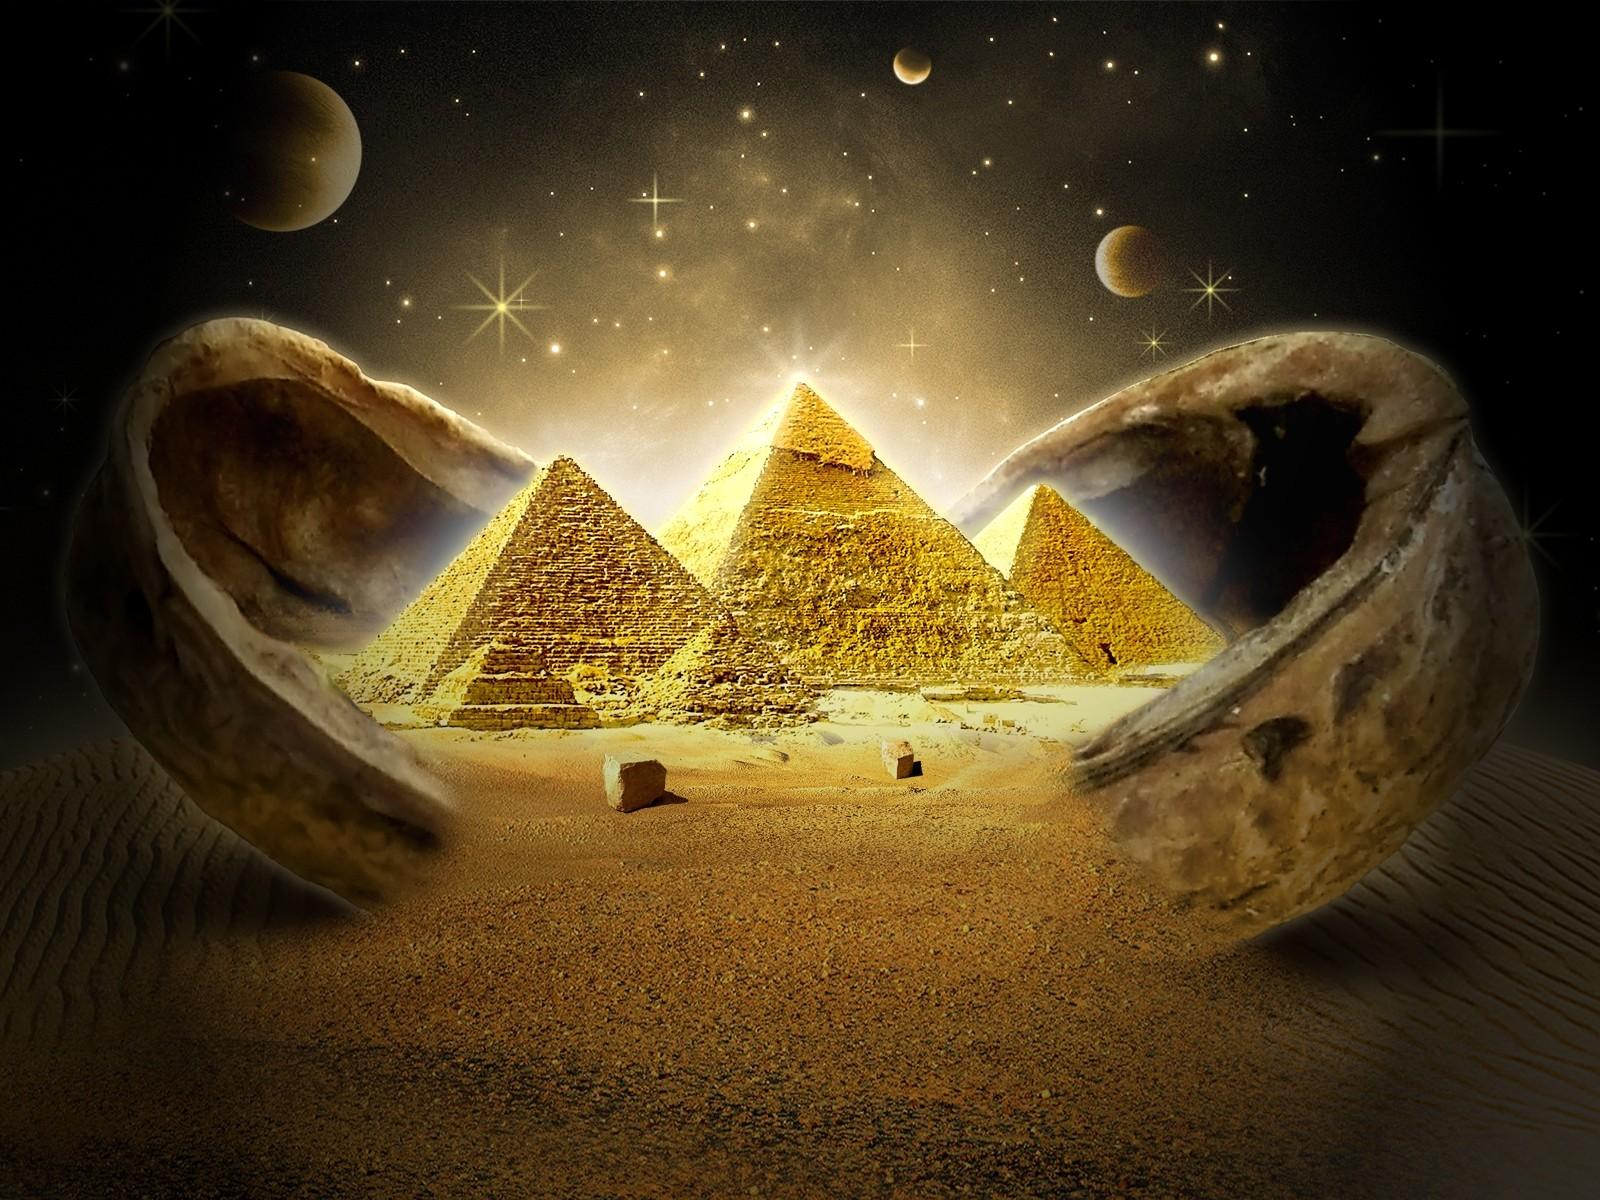 Artistic Egyptian Wallpaper 1600x1200 Artistic Egyptian 1600x1200